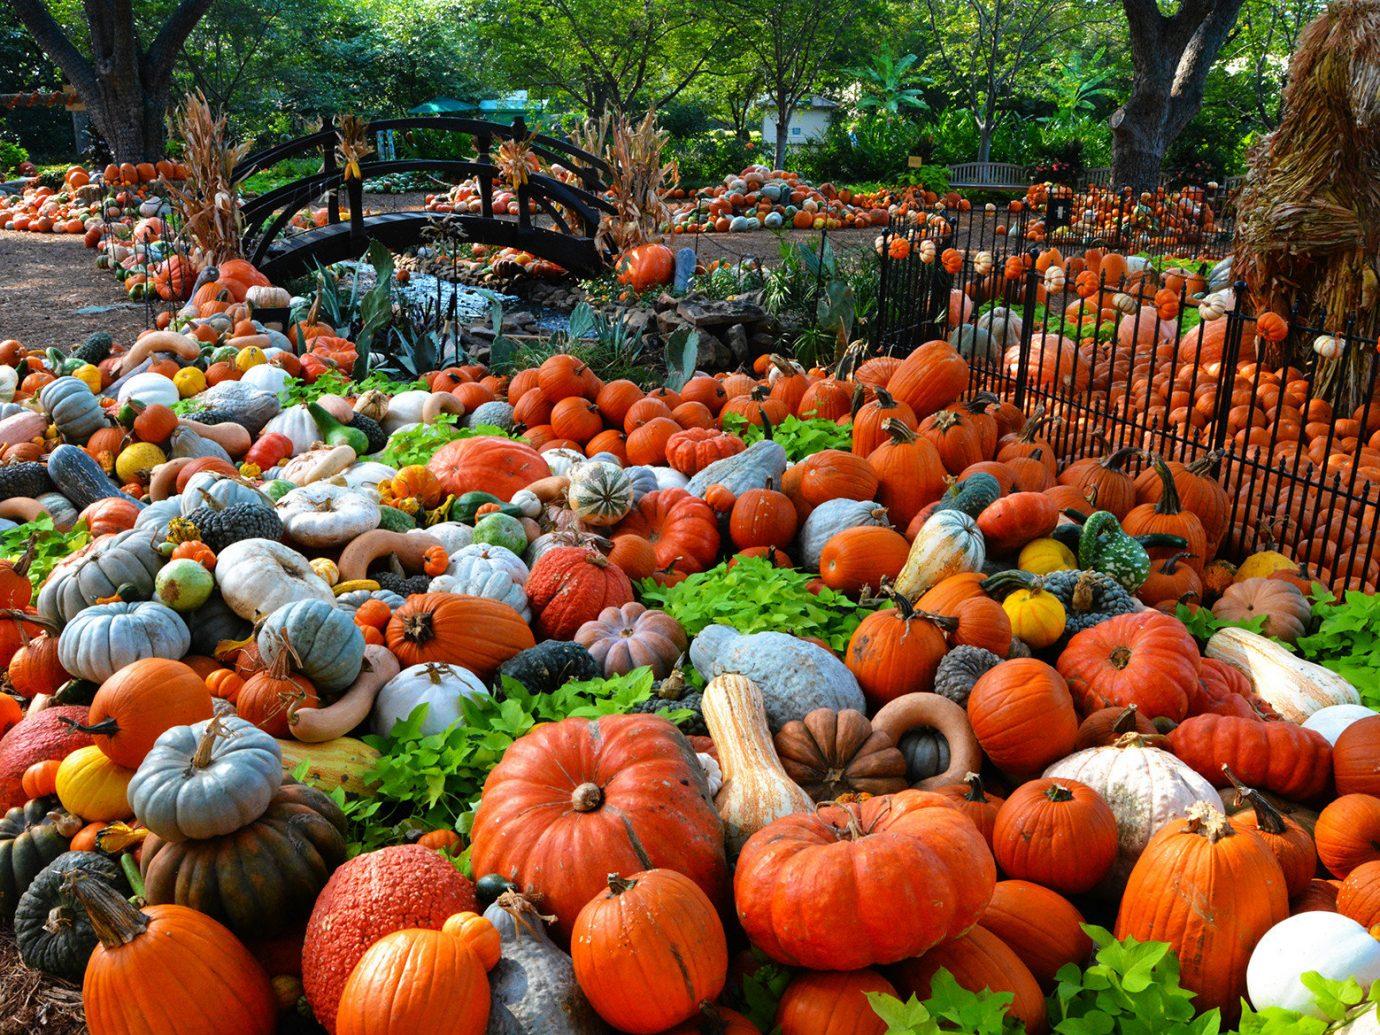 Trip Ideas tree outdoor fruit pumpkin squash calabaza produce winter squash autumn vegetable flower cucurbita gourd lined line arranged sale